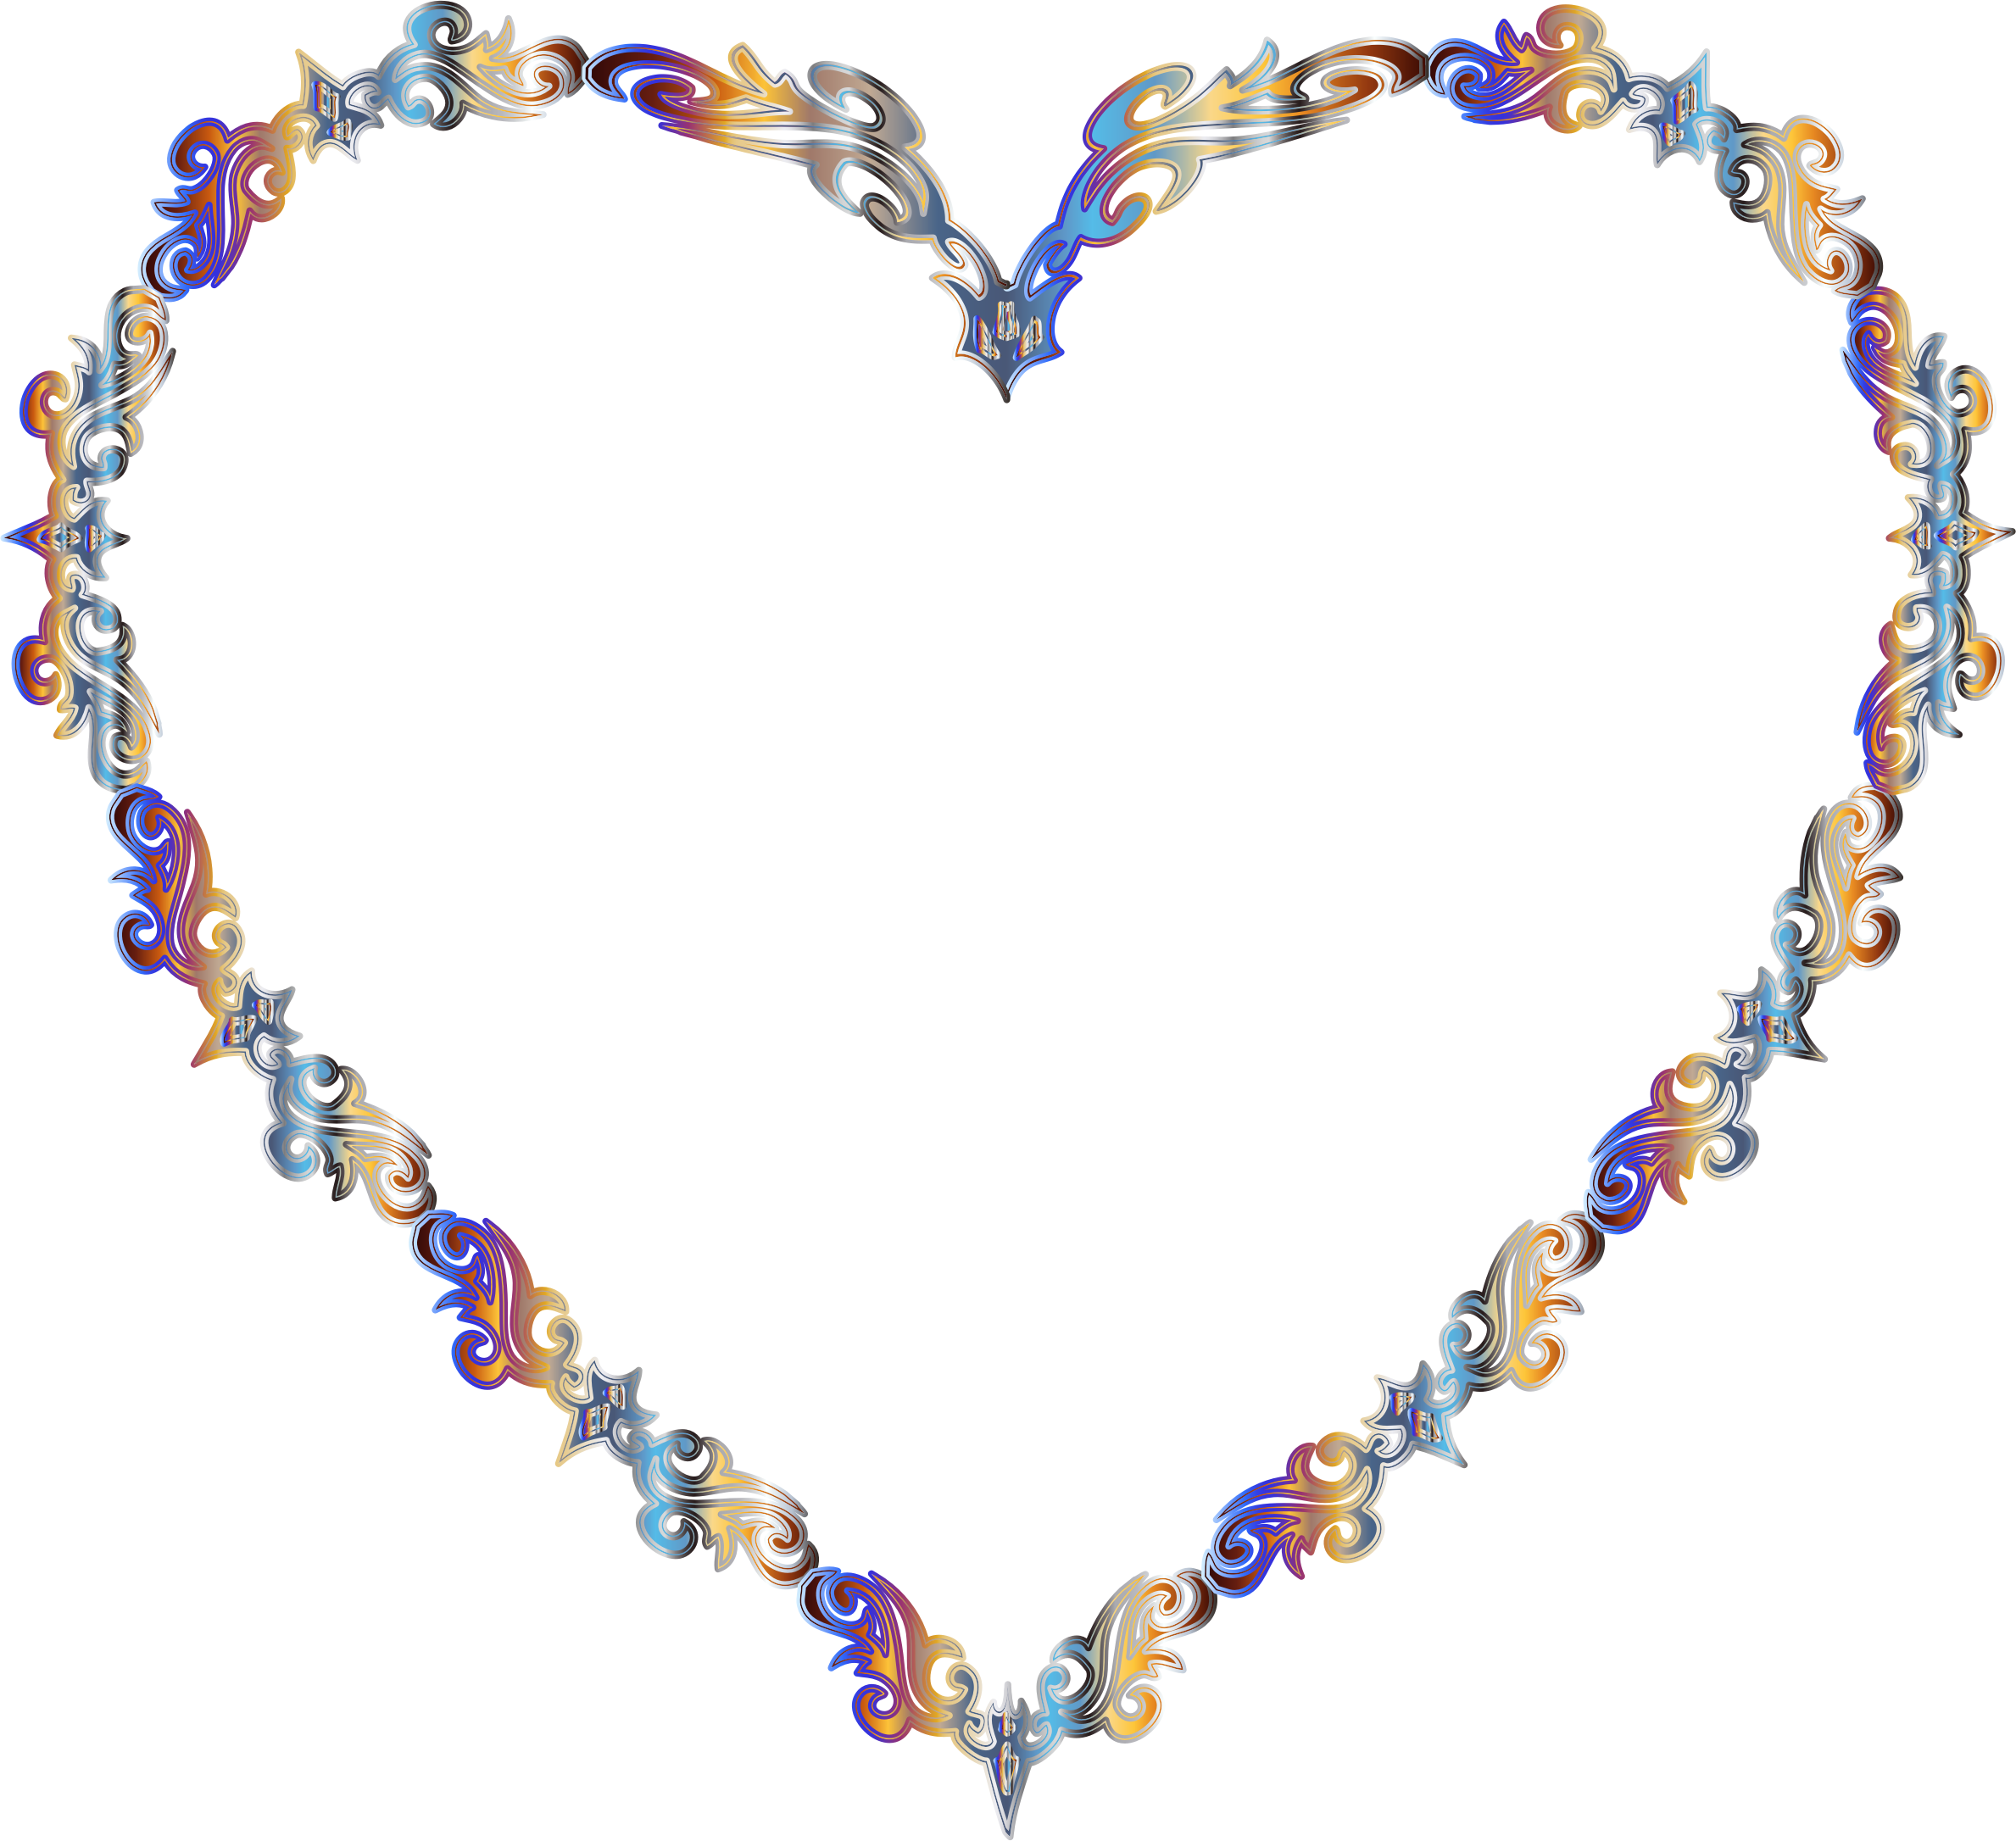 Heart clipart fancy jpg freeuse Clipart - Colorful Fancy Decorative Line Art Heart 2 jpg freeuse